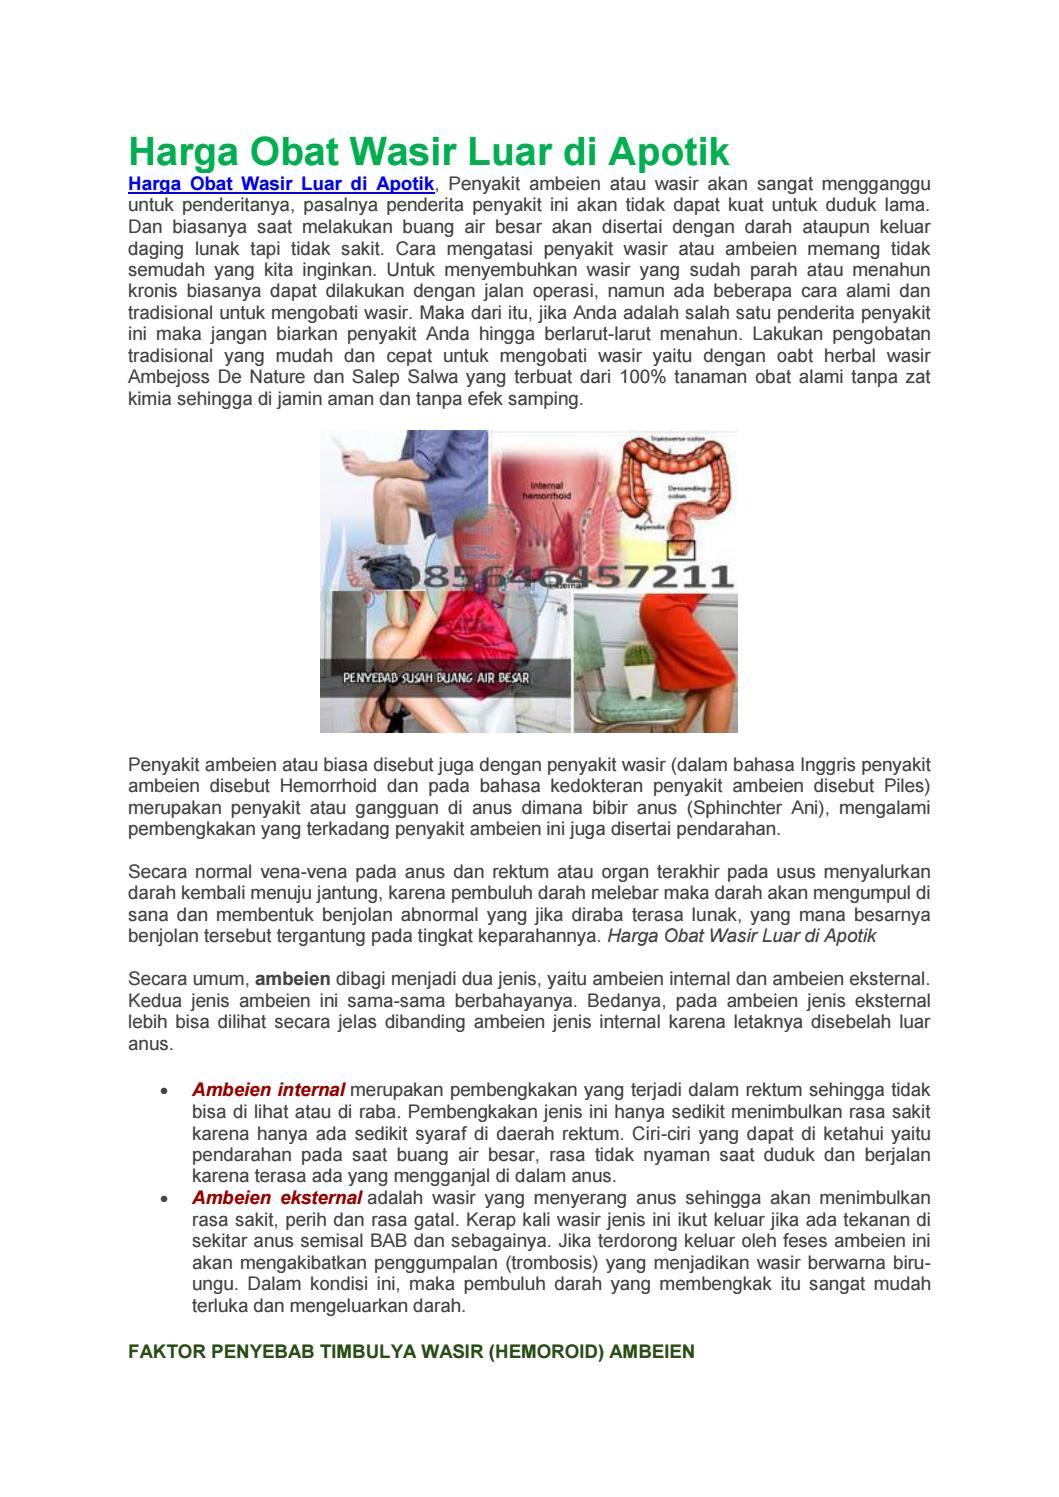 Harga Obat Wasir Luar Di Apotik By Wawan Salebu Issuu Hemmorhoida Ambien Ambeien